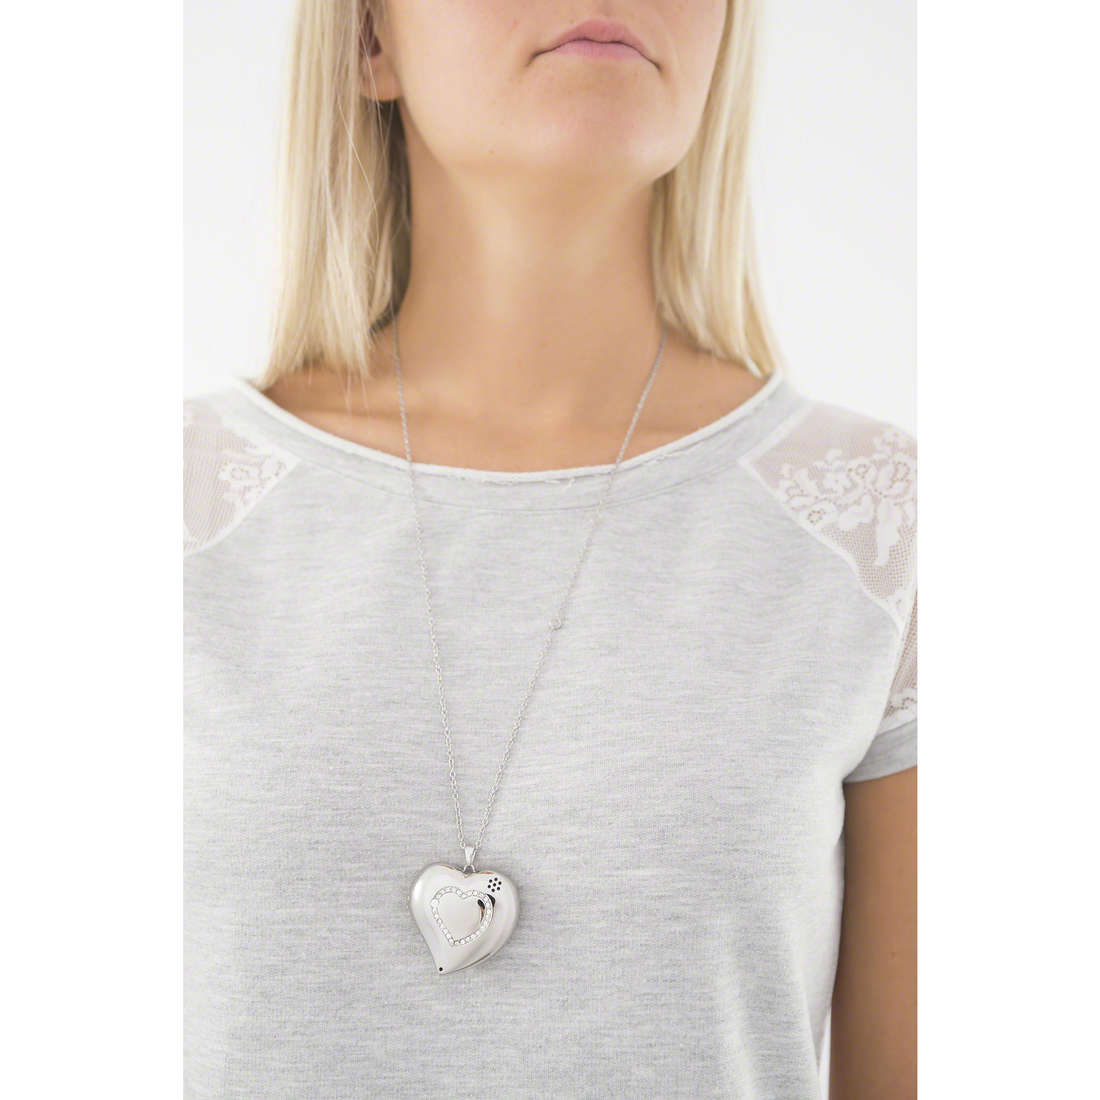 Morellato colliers Smart Jewel femme SAEW01 indosso